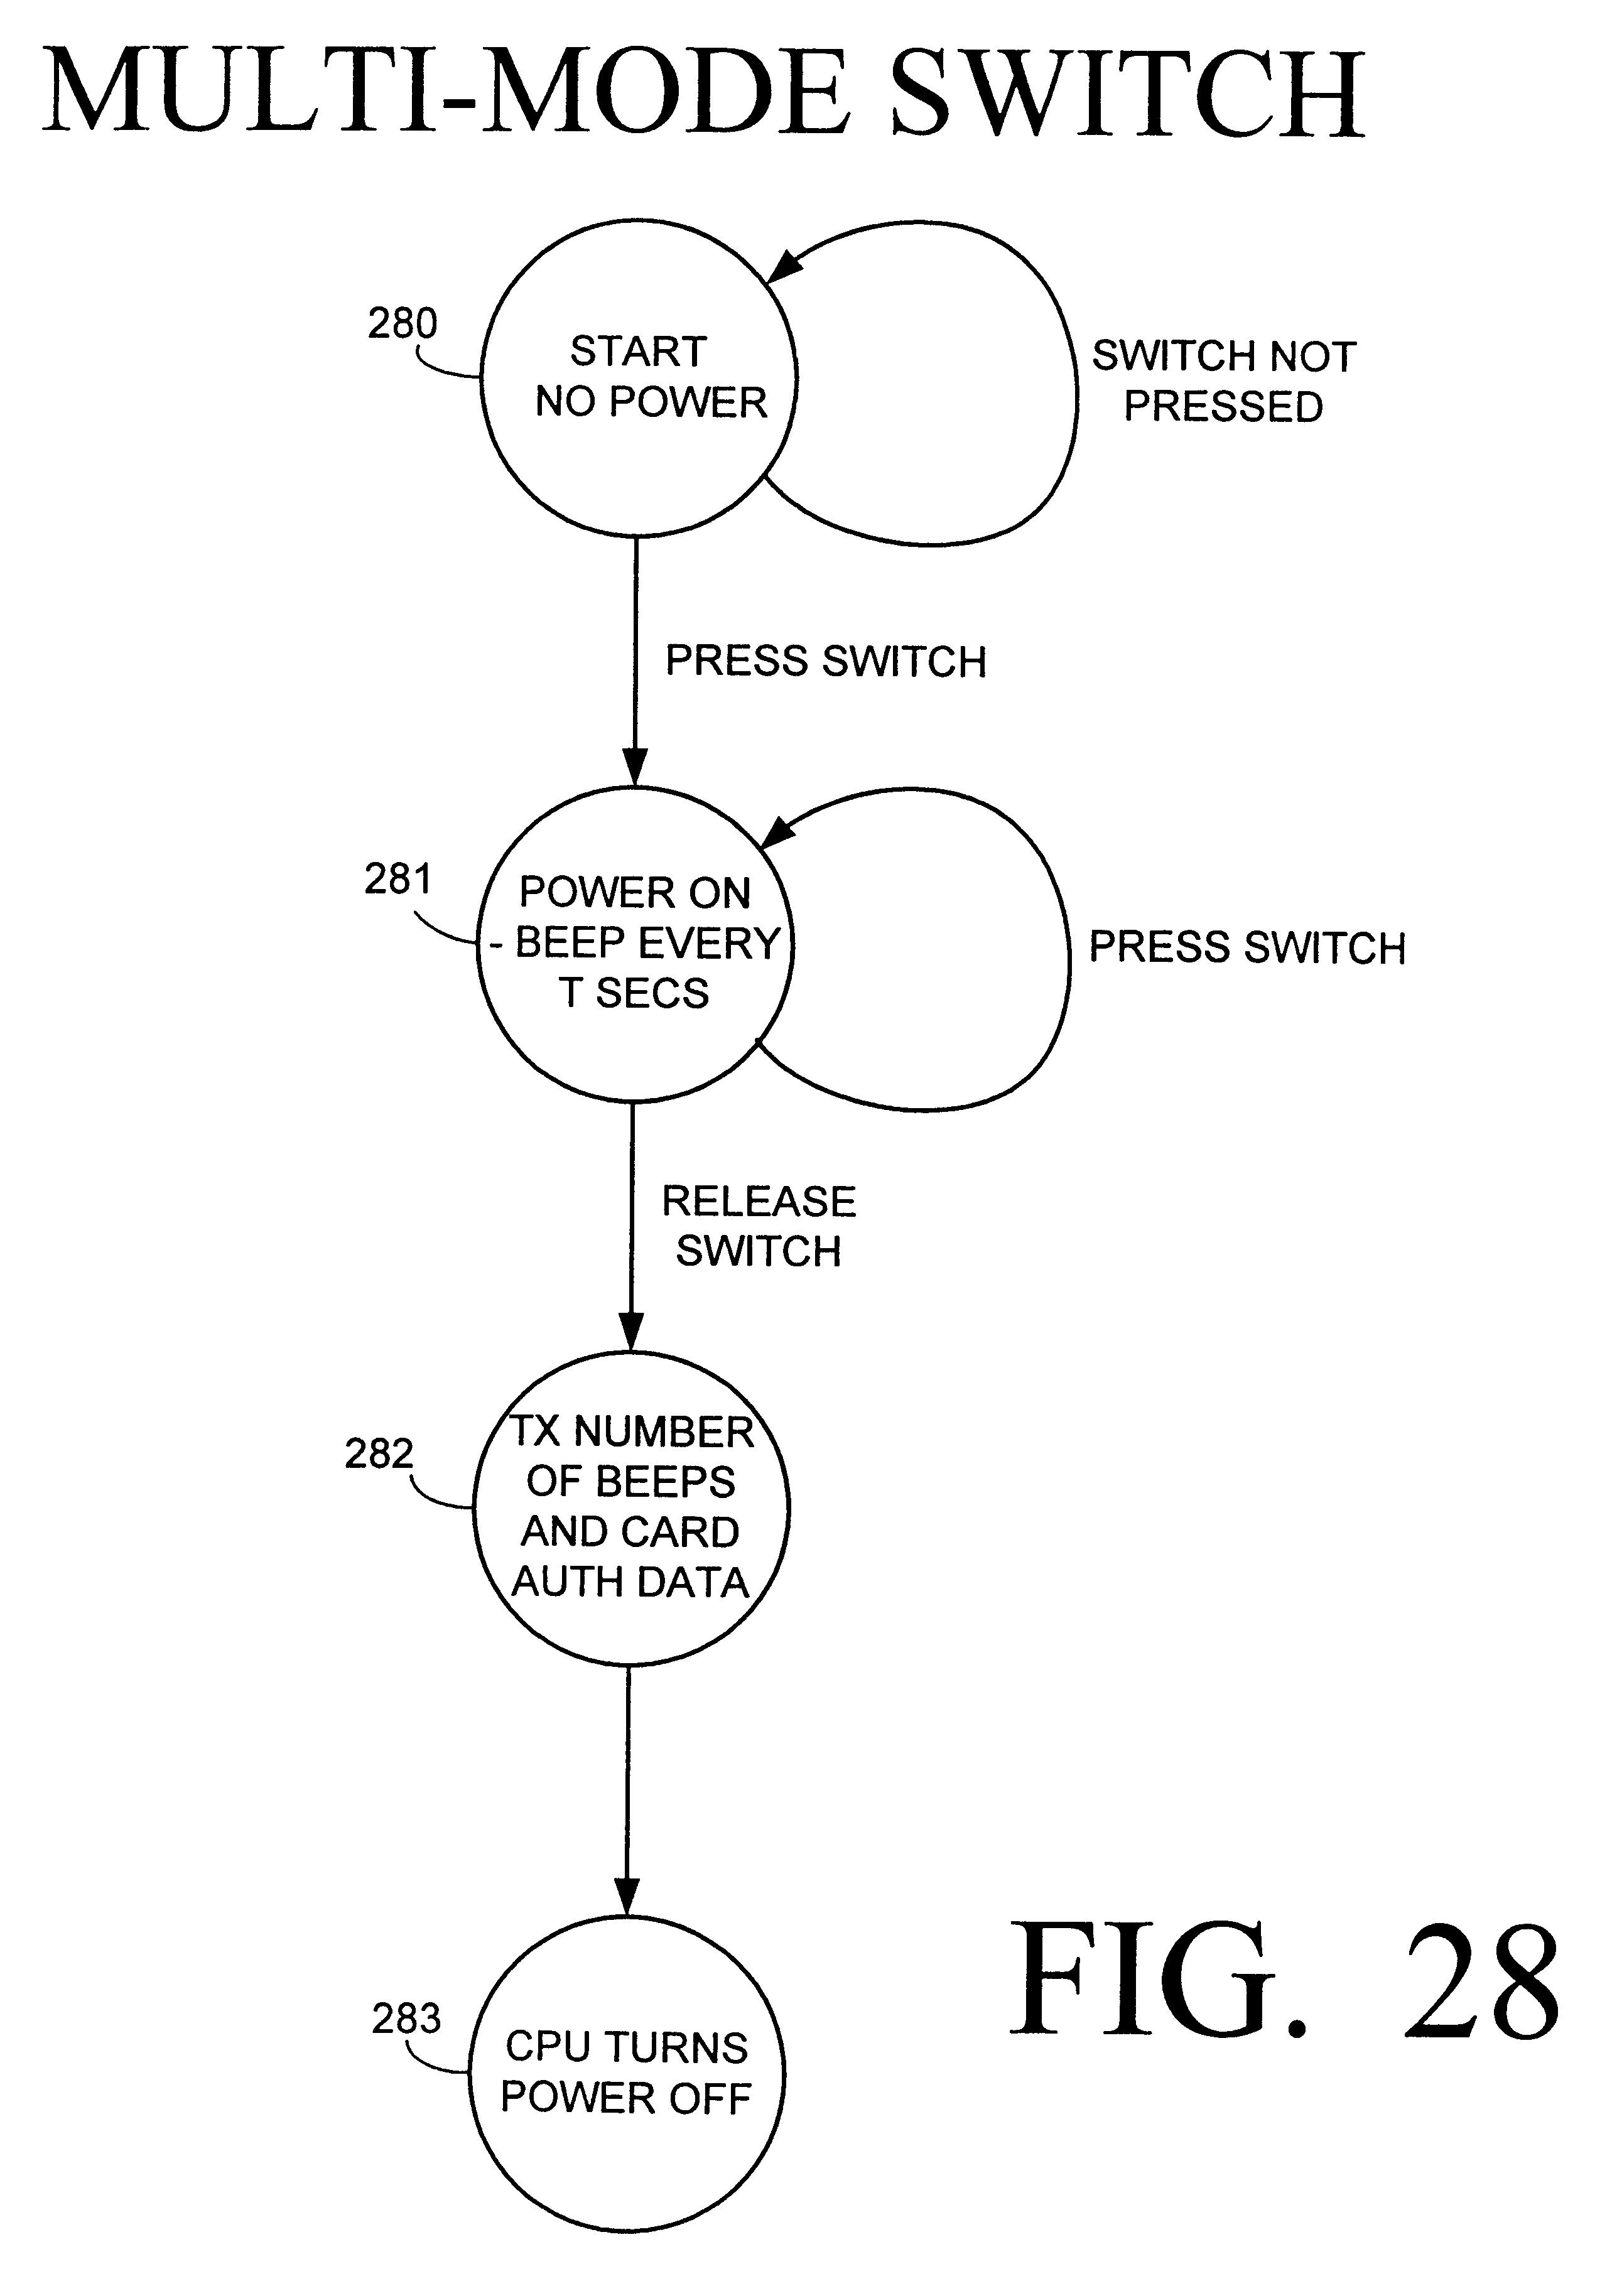 Patent US 6,607,136 B1